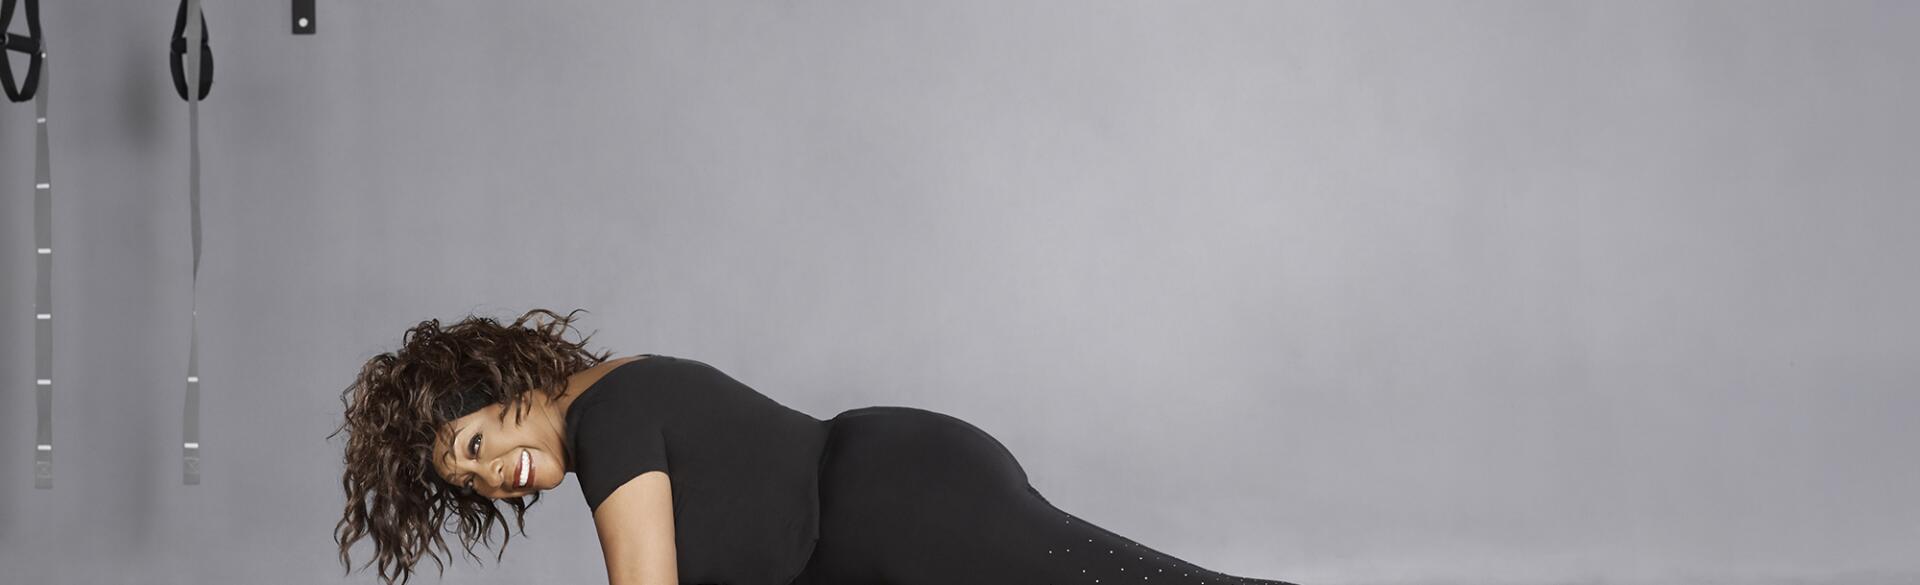 71955-Mary-Wilson-Yoga-by-Rowan-Daly_1540.jpg